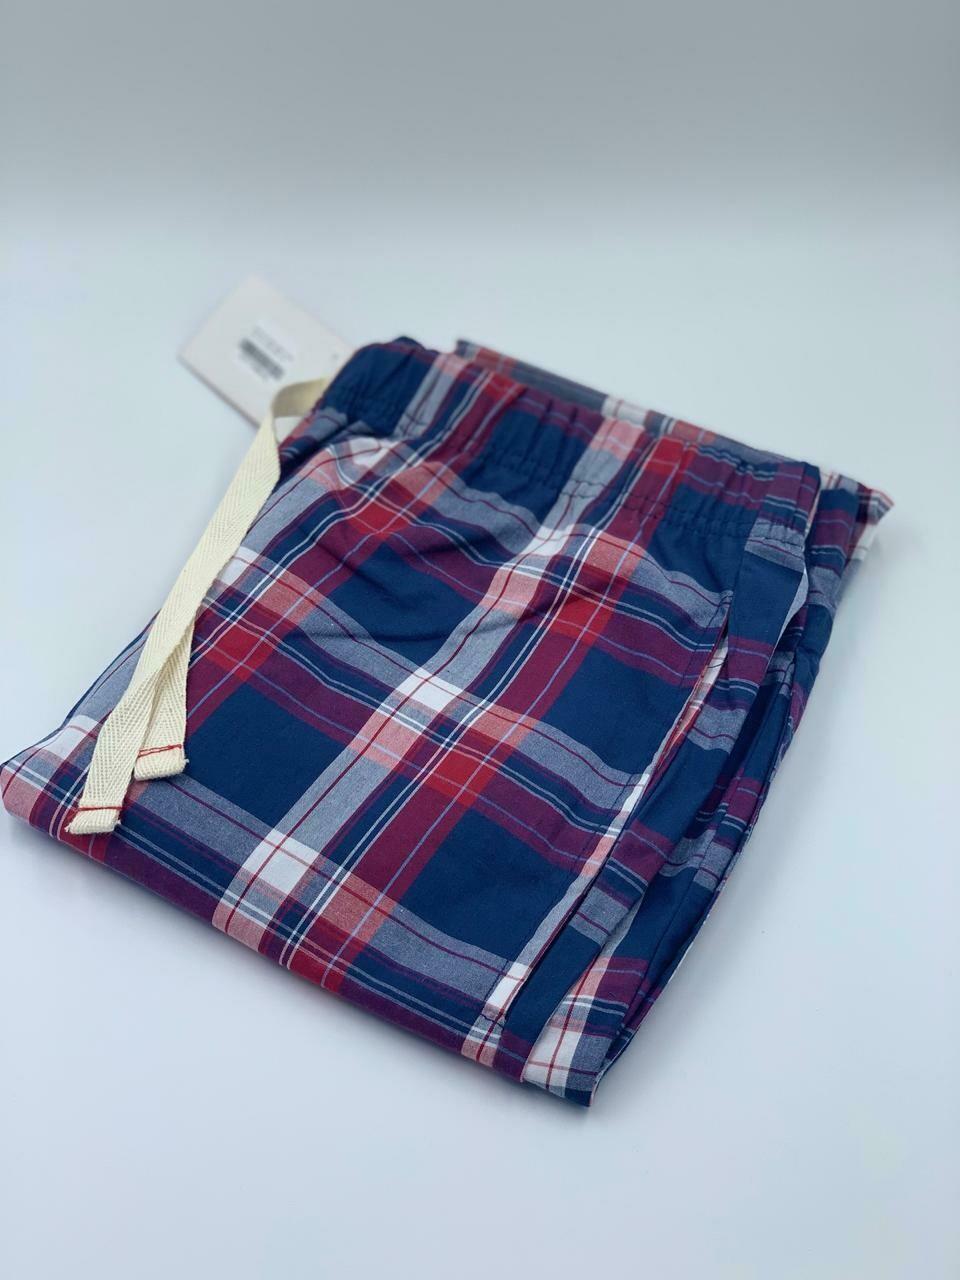 Pantalón Pijama Cantel Sleep Caballero 100% Algodón